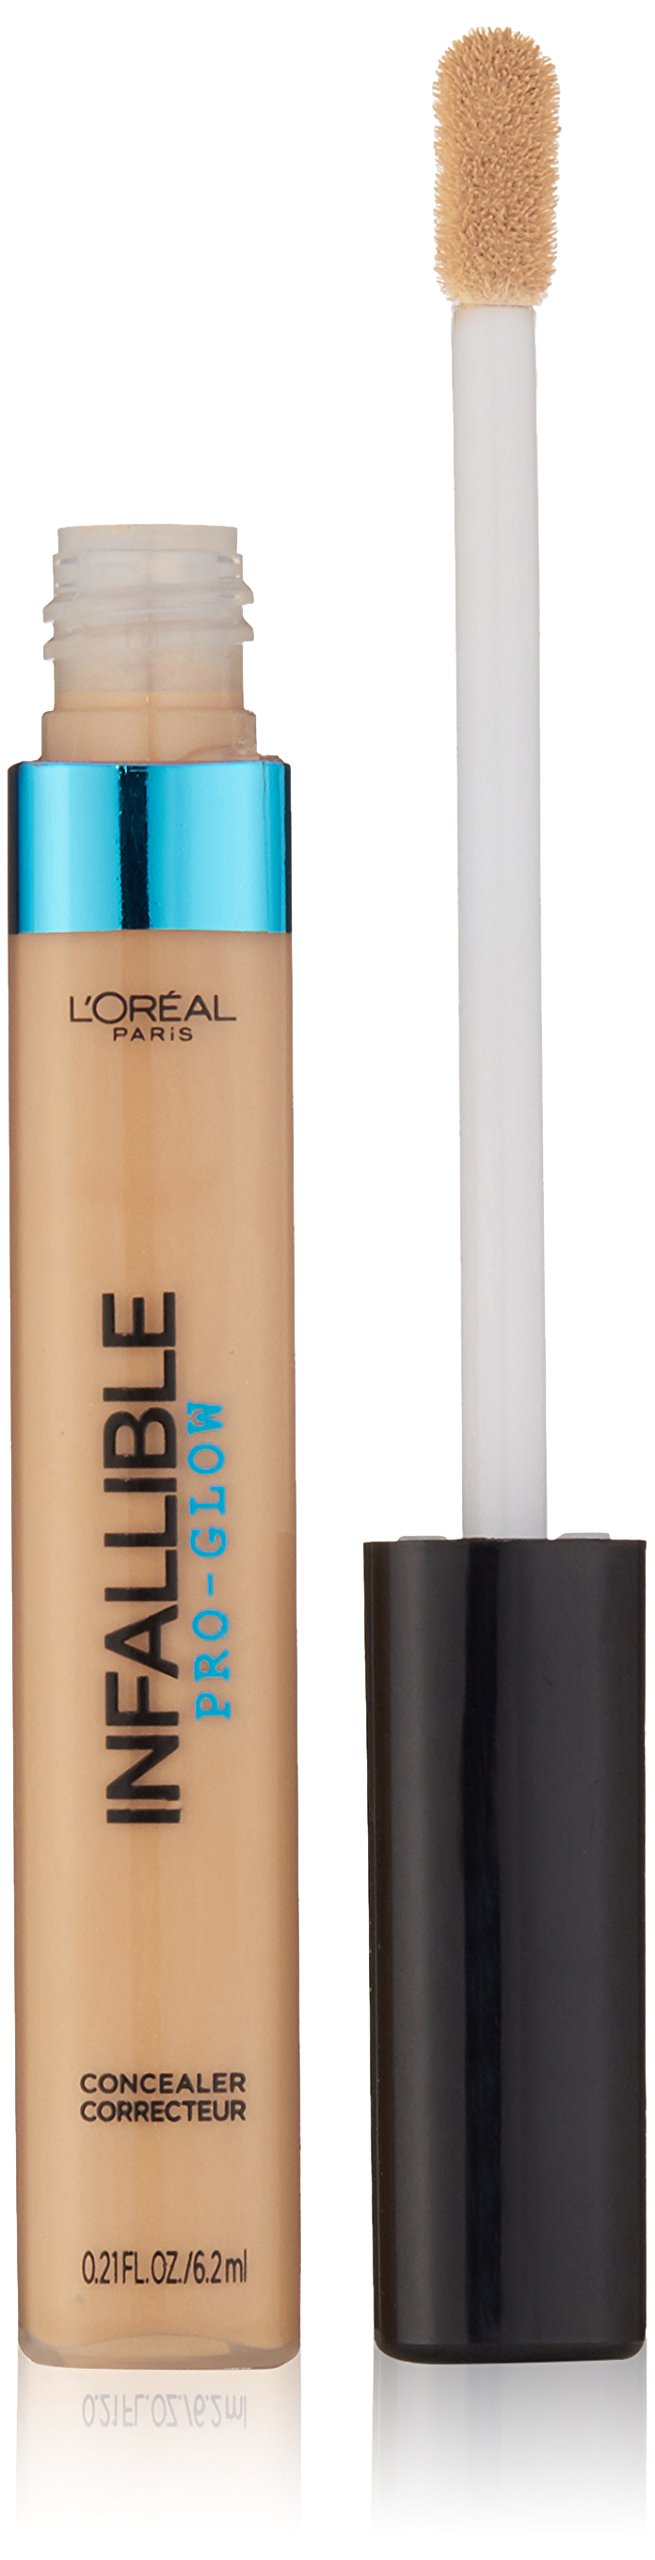 L'Oreal Paris Cosmetics Infallible Pro Glow Concealer, Creamy Natural, 0.21 Fluid Ounce